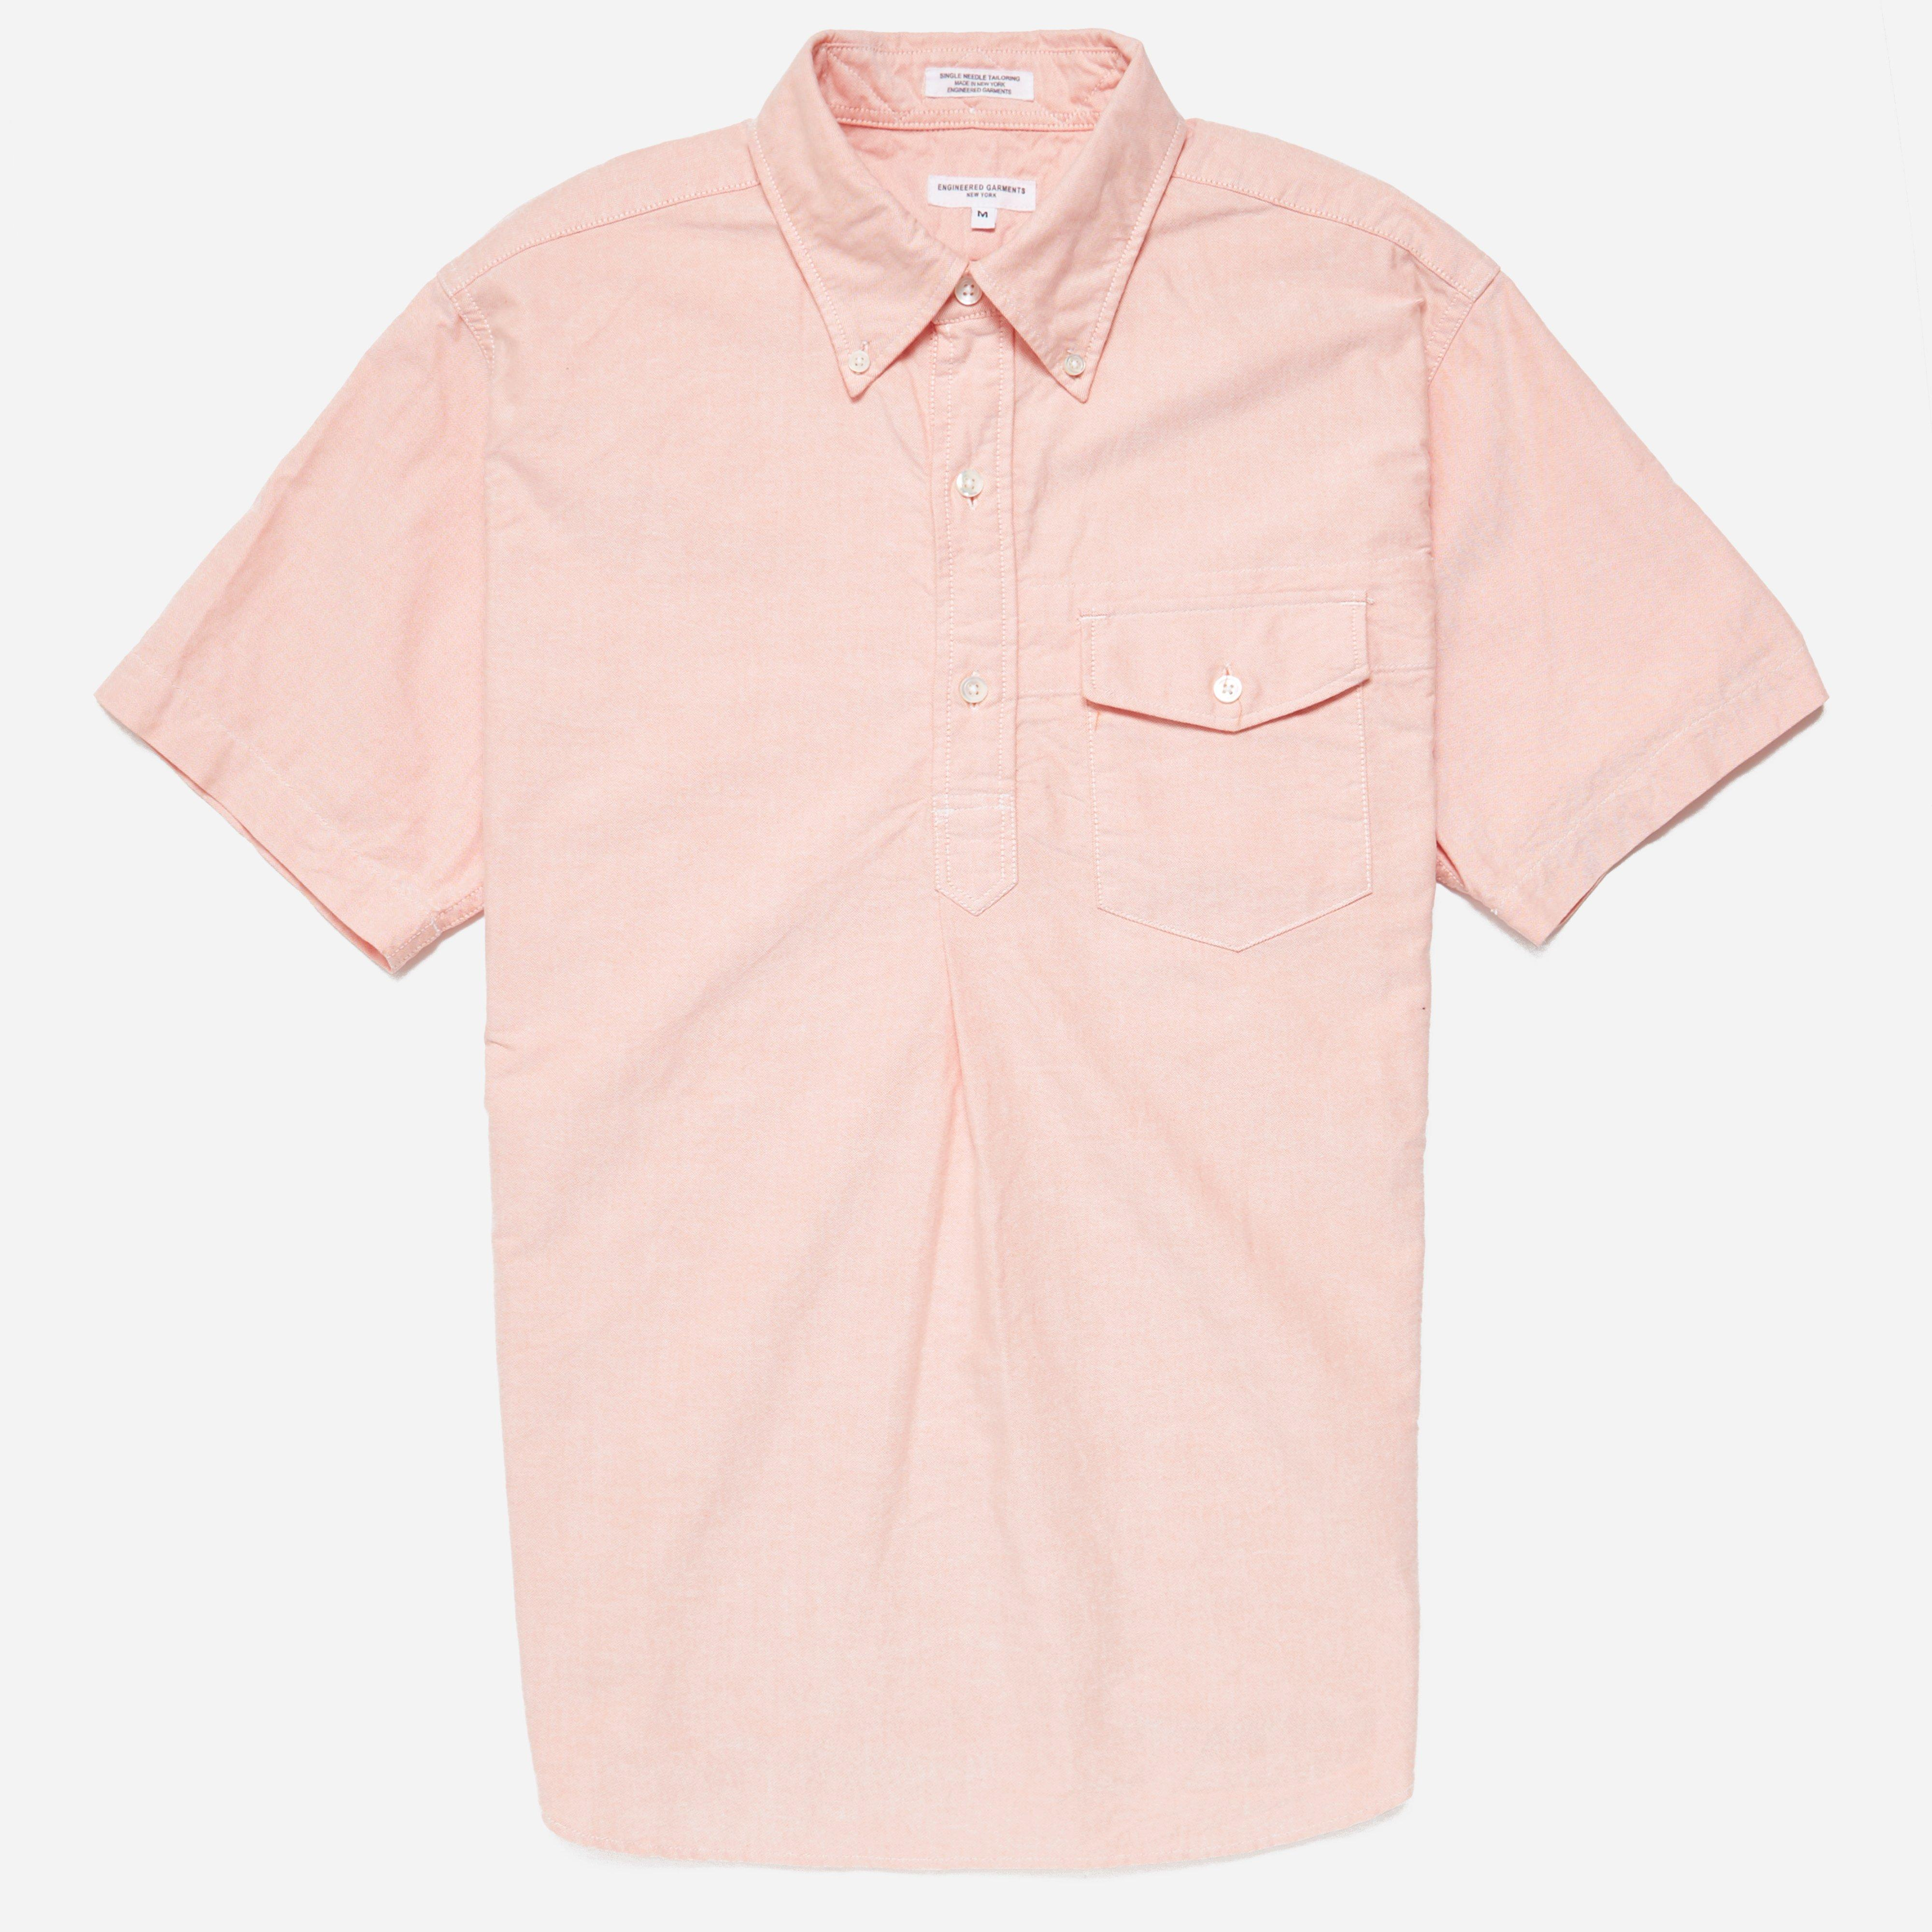 Engineered Garments Popover BD Oxford Shirt